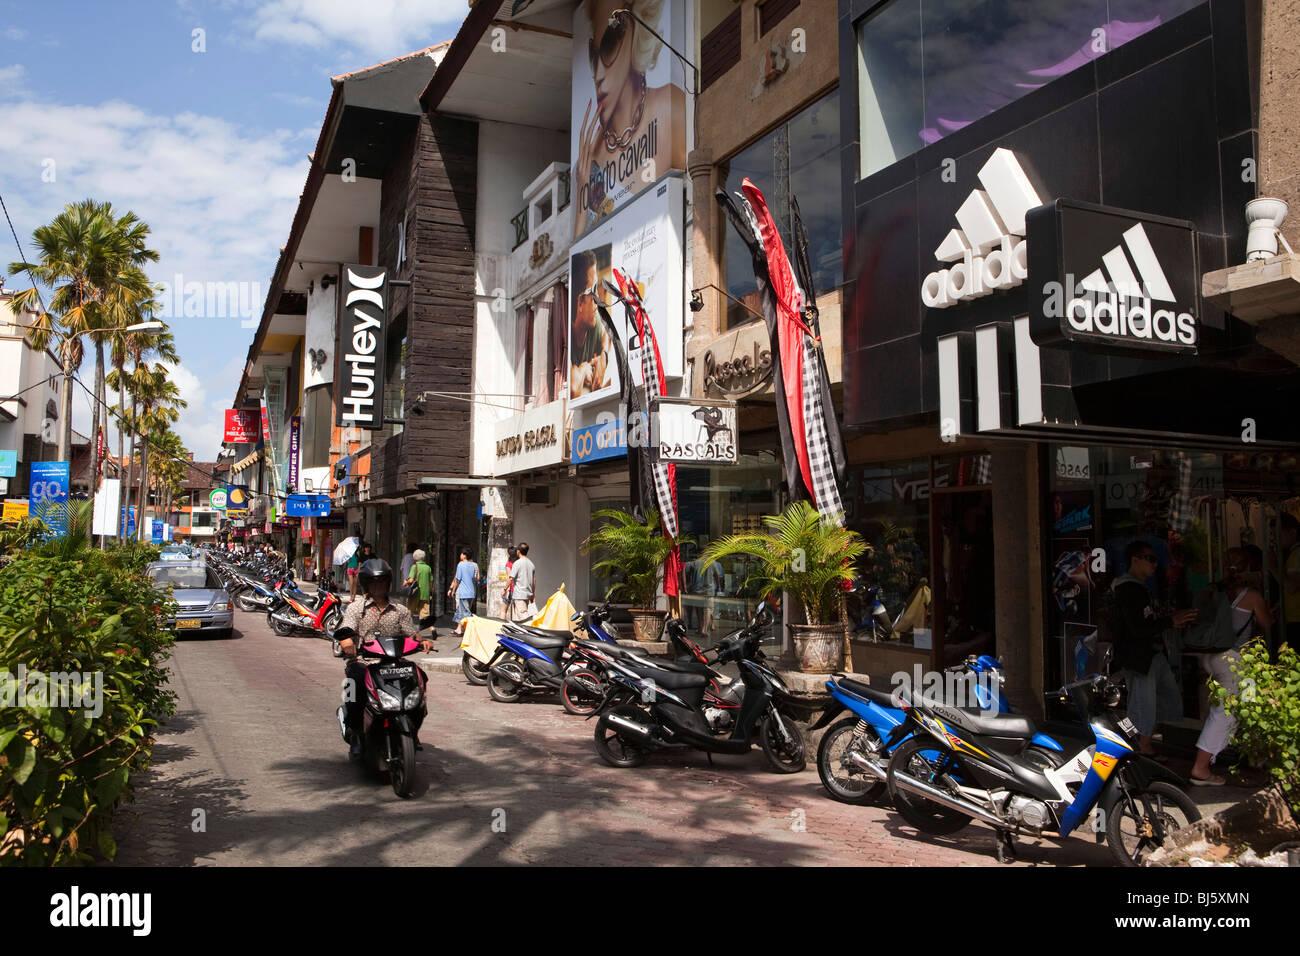 American Bali Tour Companies